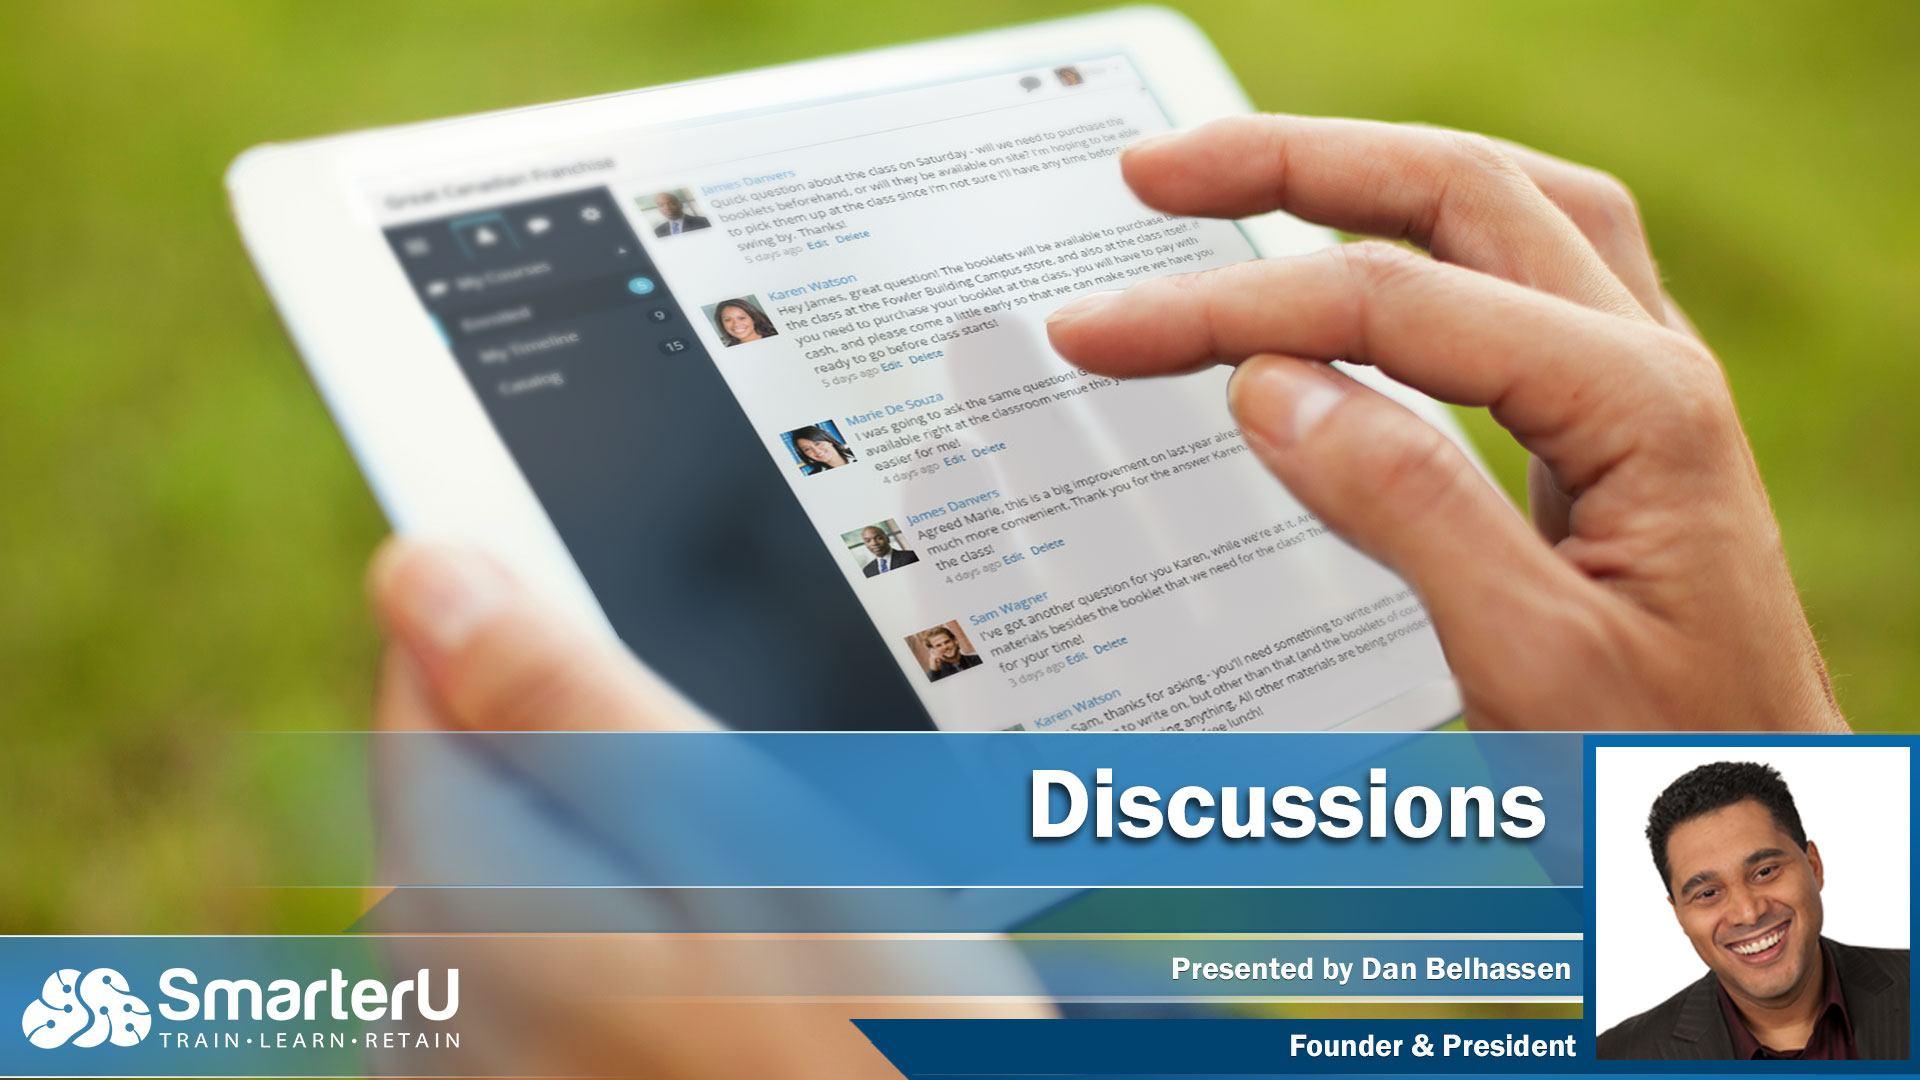 SmarterU LMS Discussion Forums - SmarterU LMS - Online Training Software